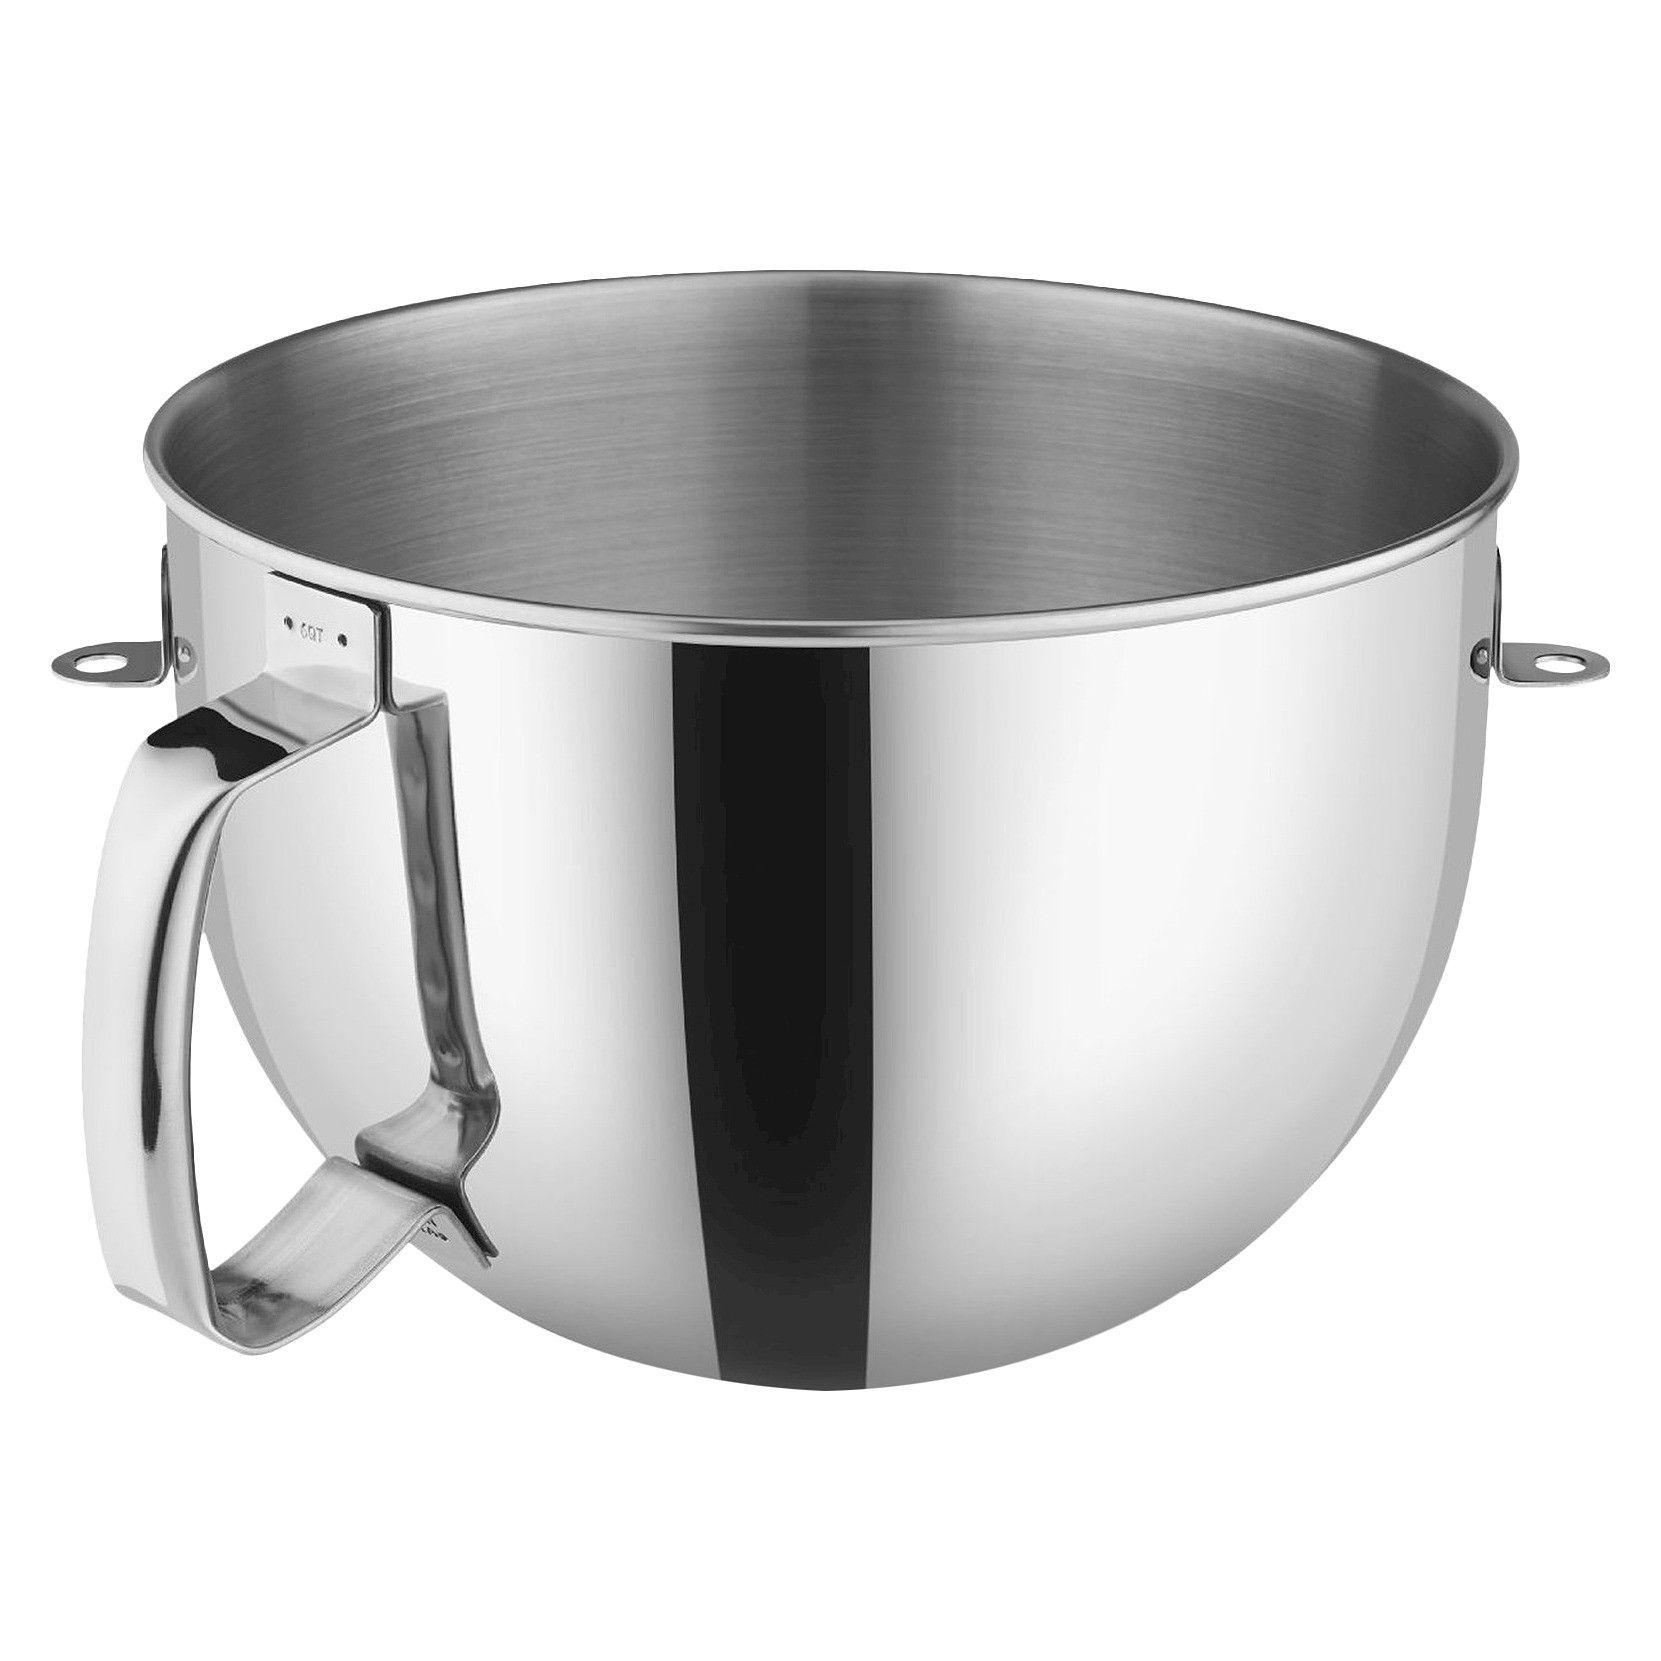 Kitchenaid 6qt bowllift polished stainless steel bowl